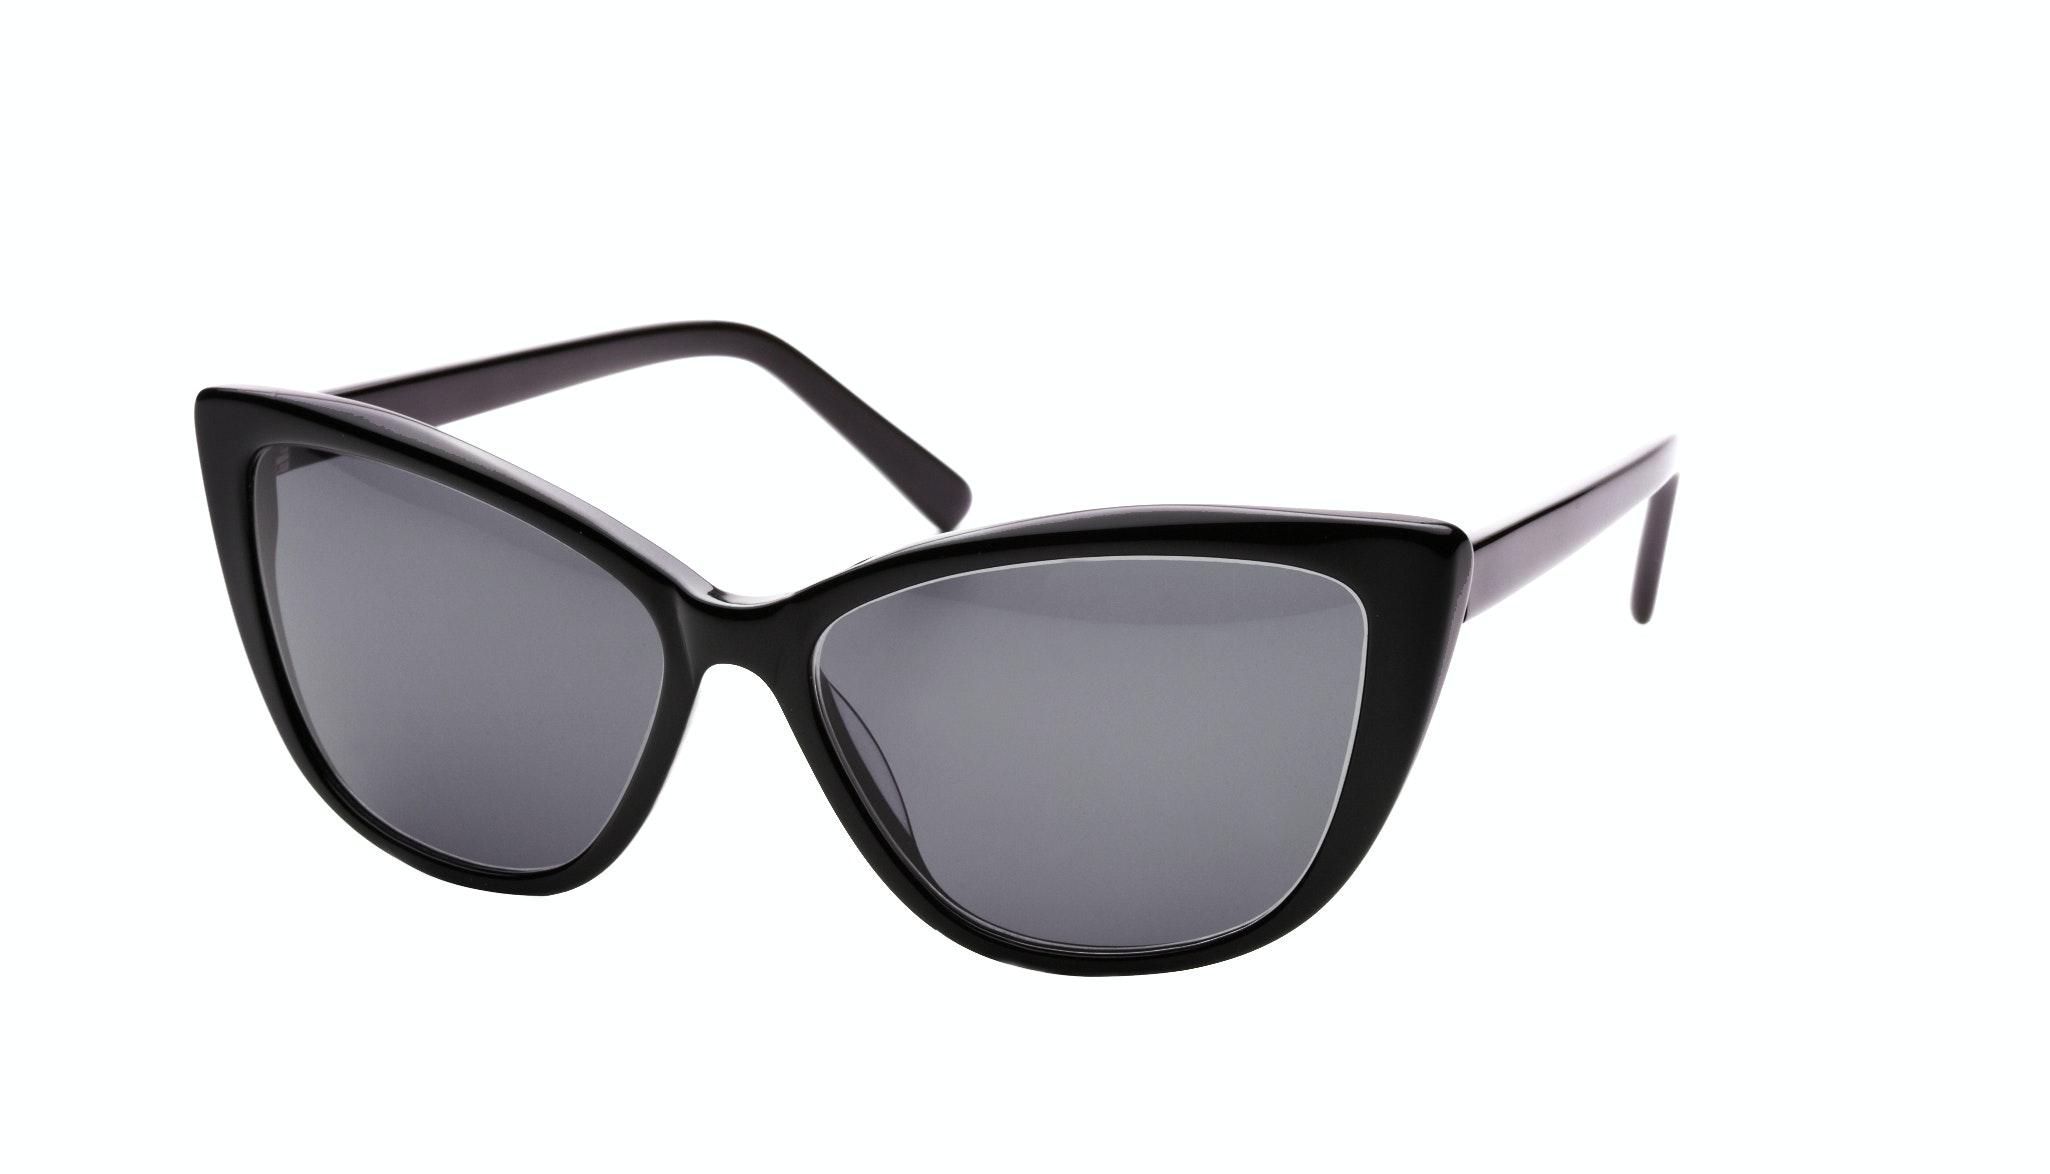 Affordable Fashion Glasses Cat Eye Daring Cateye Sunglasses Women Dolled Up Black Tilt